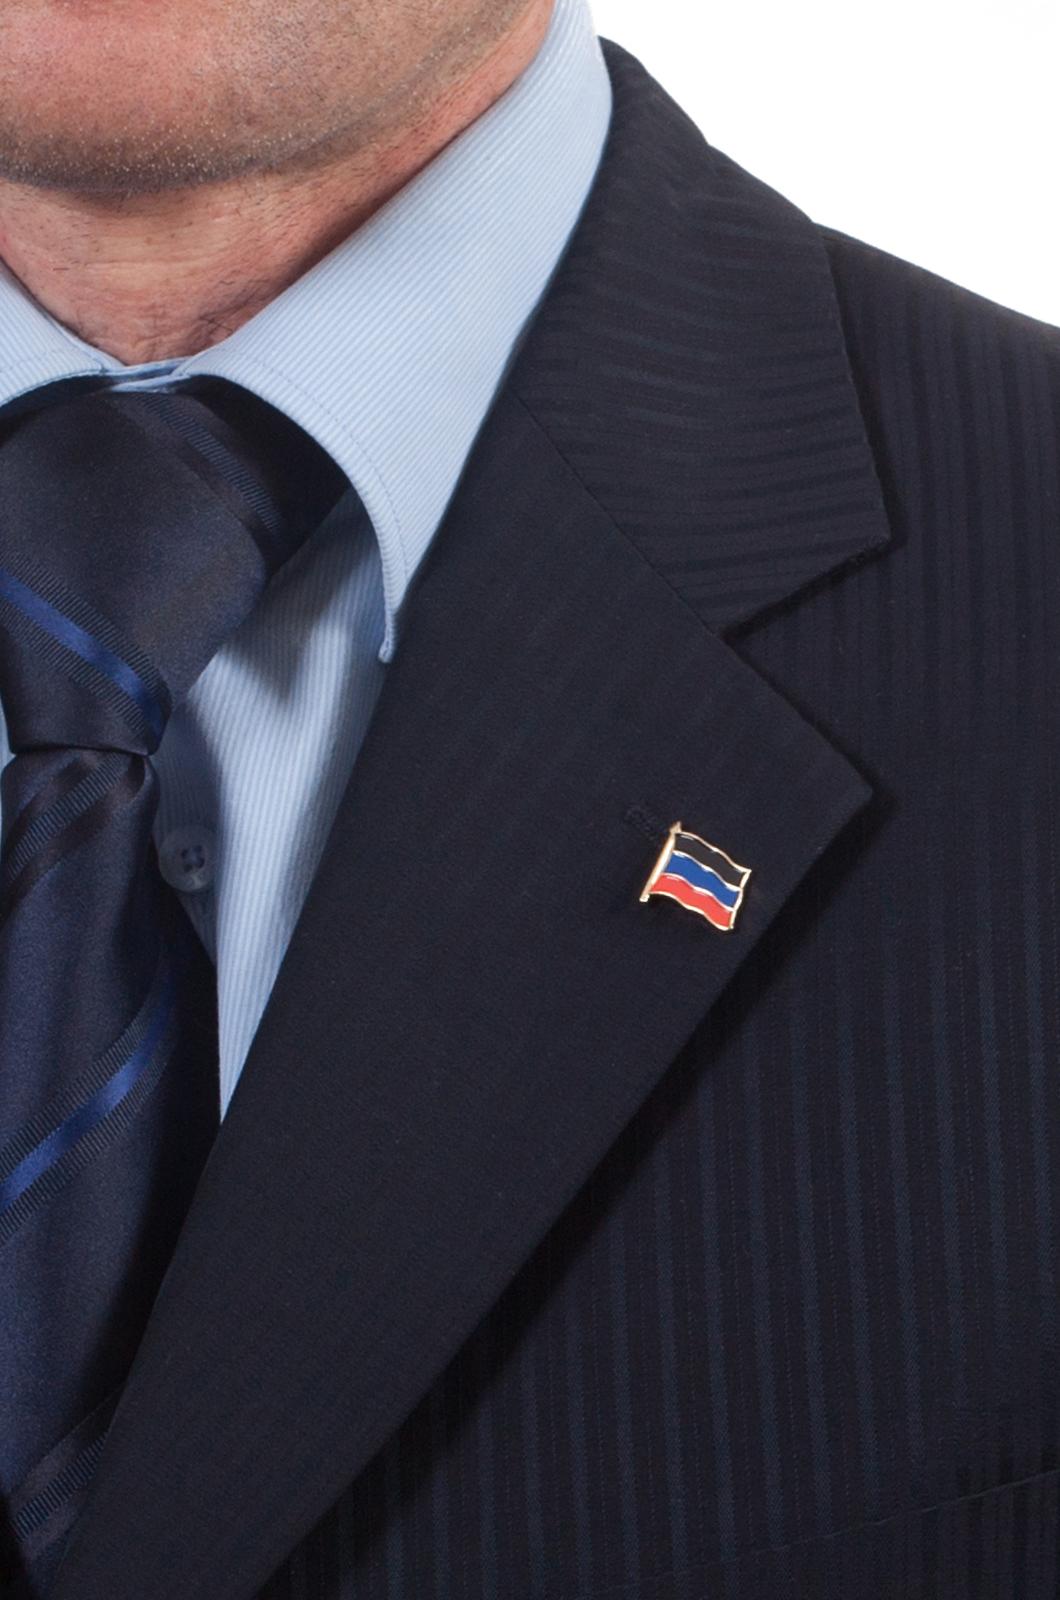 Значок ДНР - вид на пиджаке